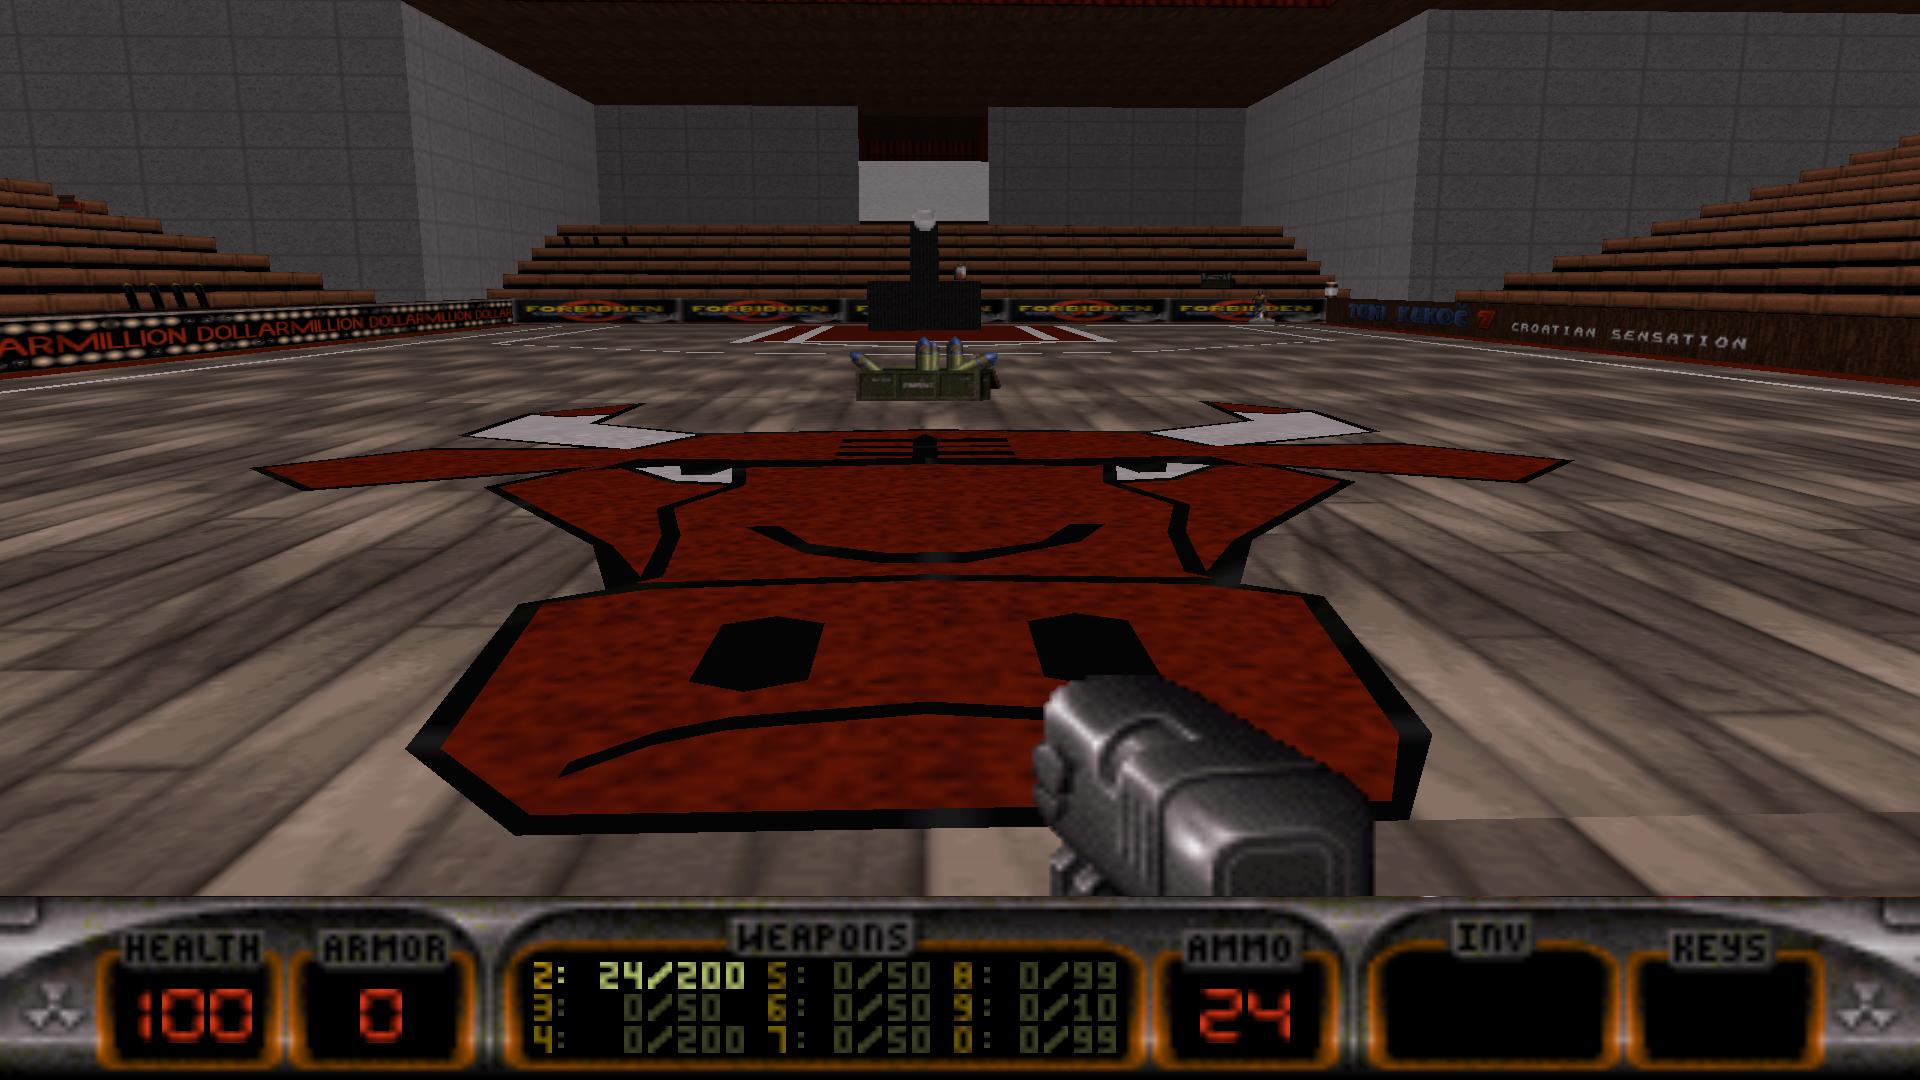 BULLS Duke Nukem 3D Map